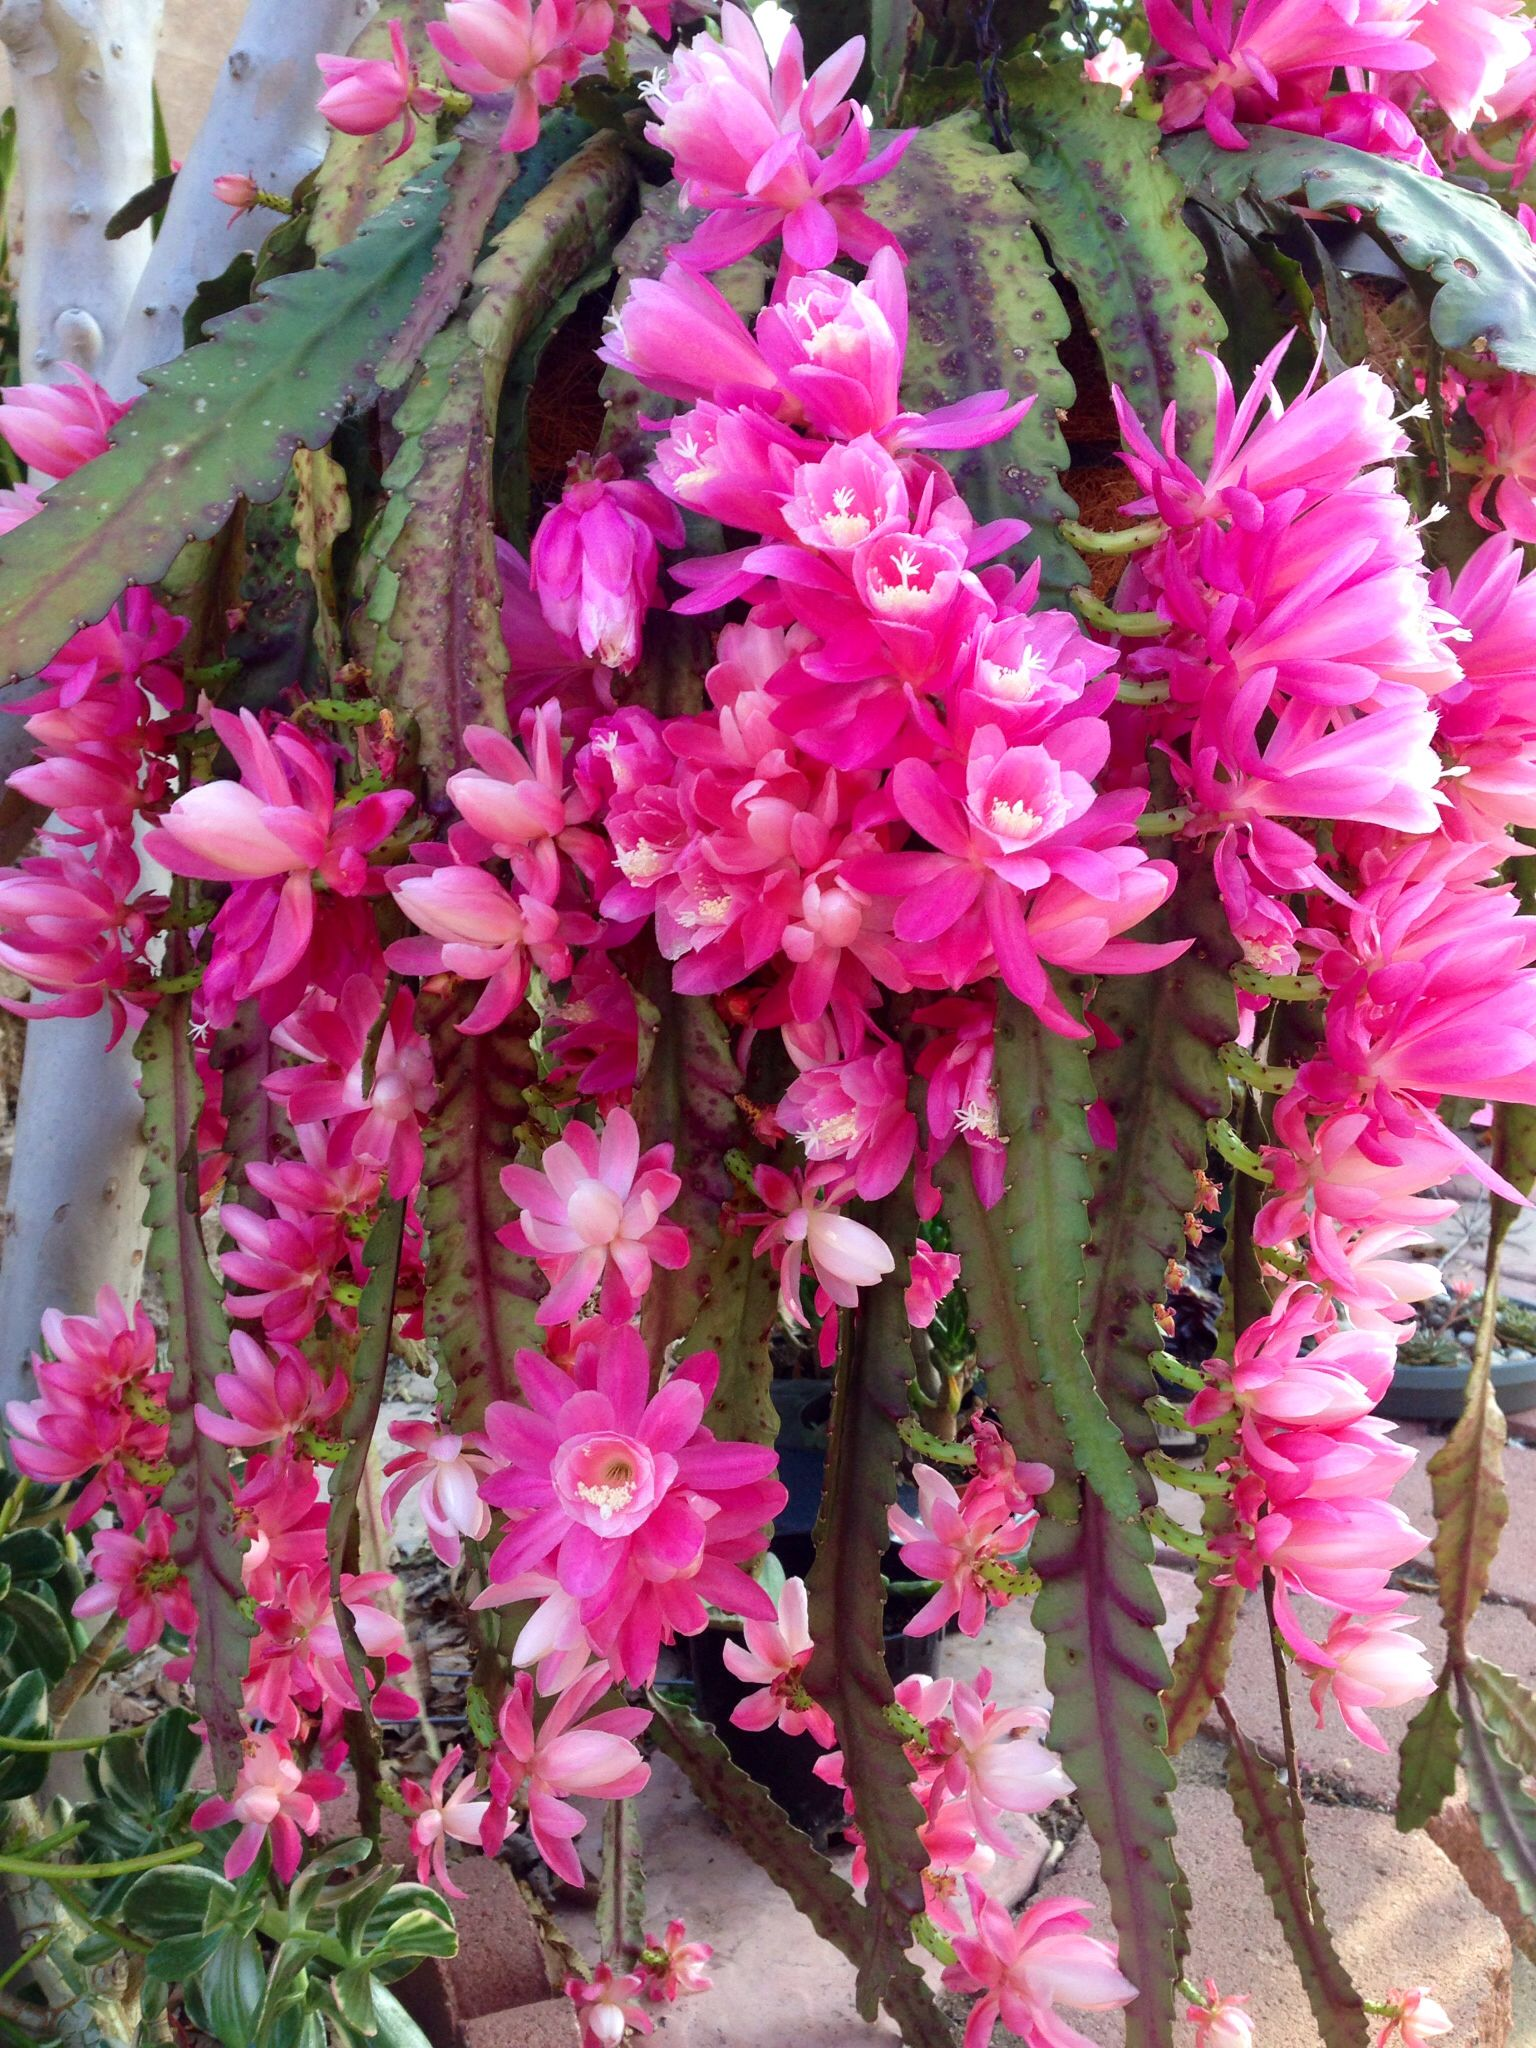 Flowers unique flowers beautiful flowers orchid cactus cactus flower - Orchid Cactus Orchid Cactus Orchid Cactuscactus Plantscactus Flowerchristmas Cactusbeautiful Flowersorchidshouseplantsmaysucculents